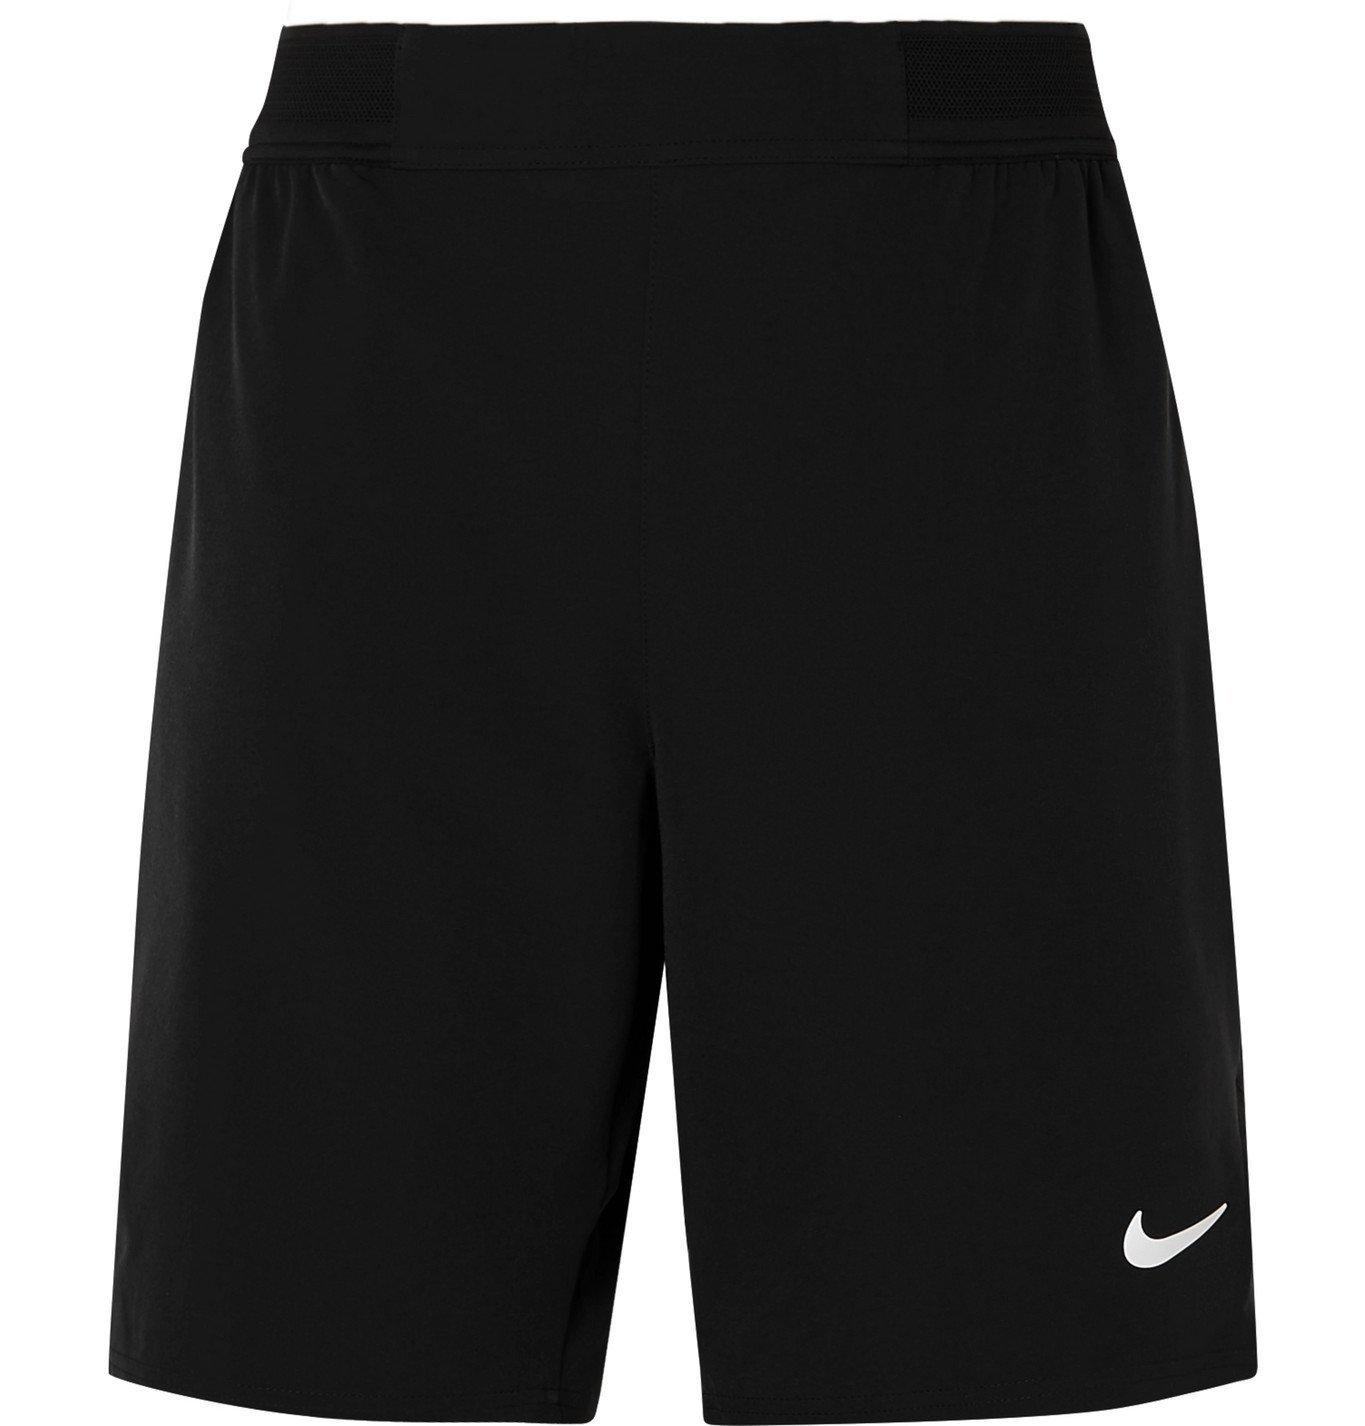 Photo: Nike Tennis - NikeCourt Ace Flex Tennis Shorts - Black